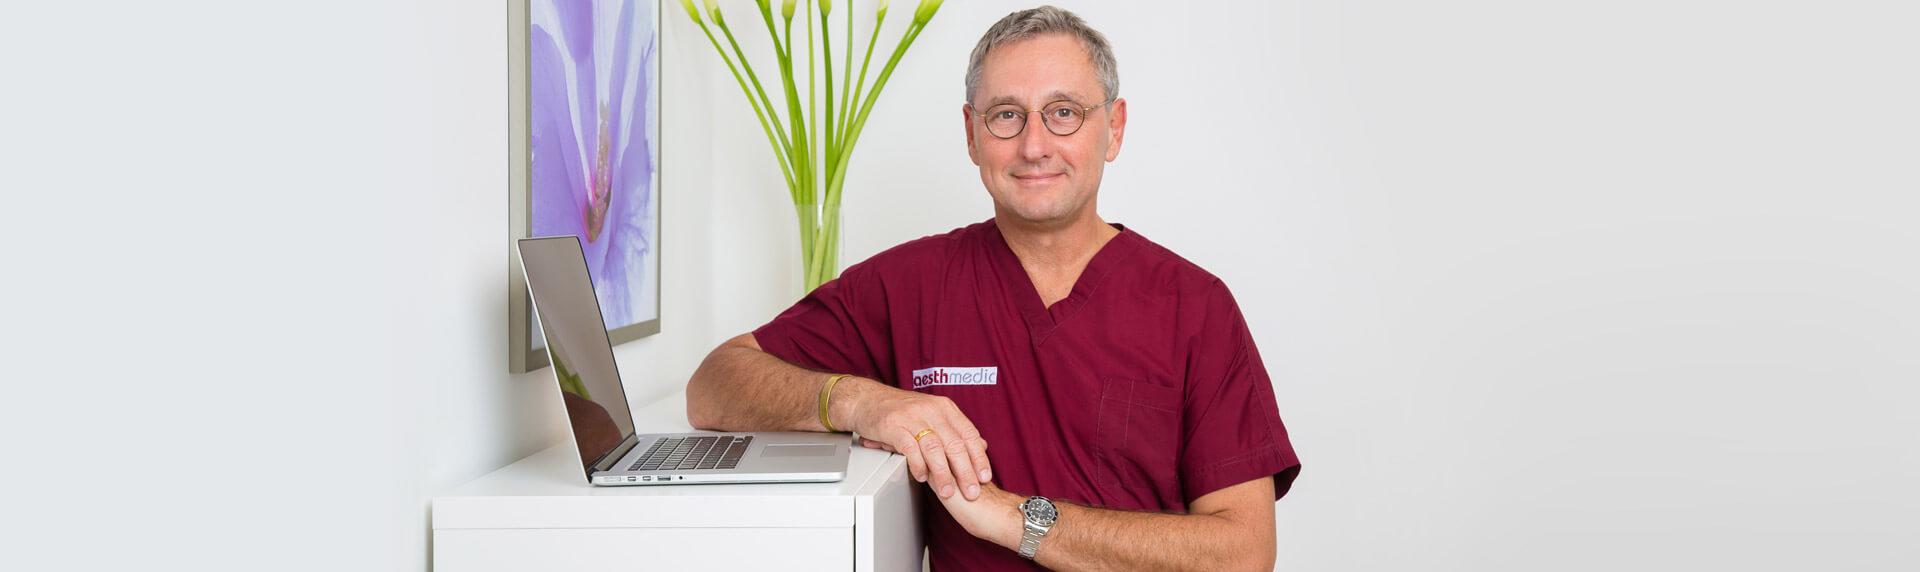 Dr. Med. Edwin Hilbert Berlin aesthmedic